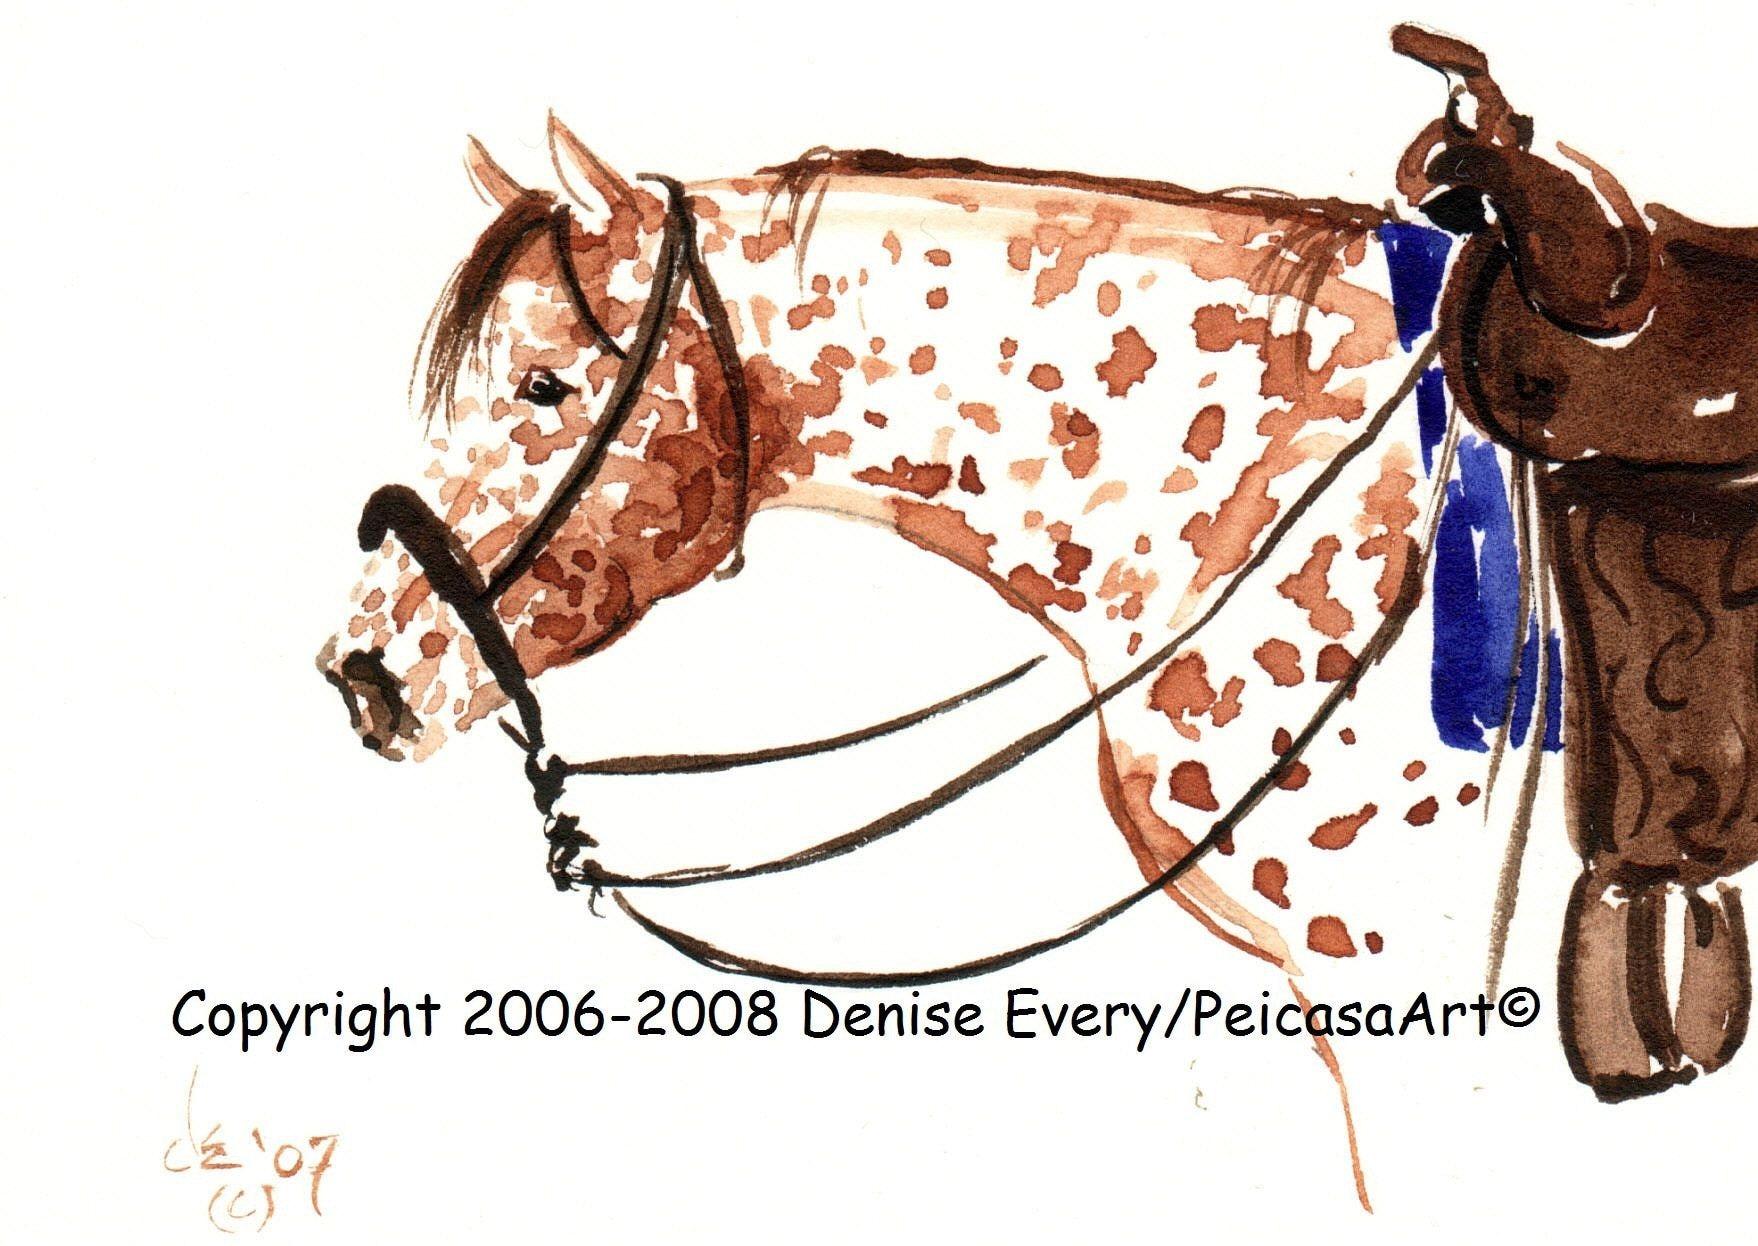 4x6 Print  Sorrel Leopard Appaloosa Horse in Western Tack Bosal Hackamore Equine Art